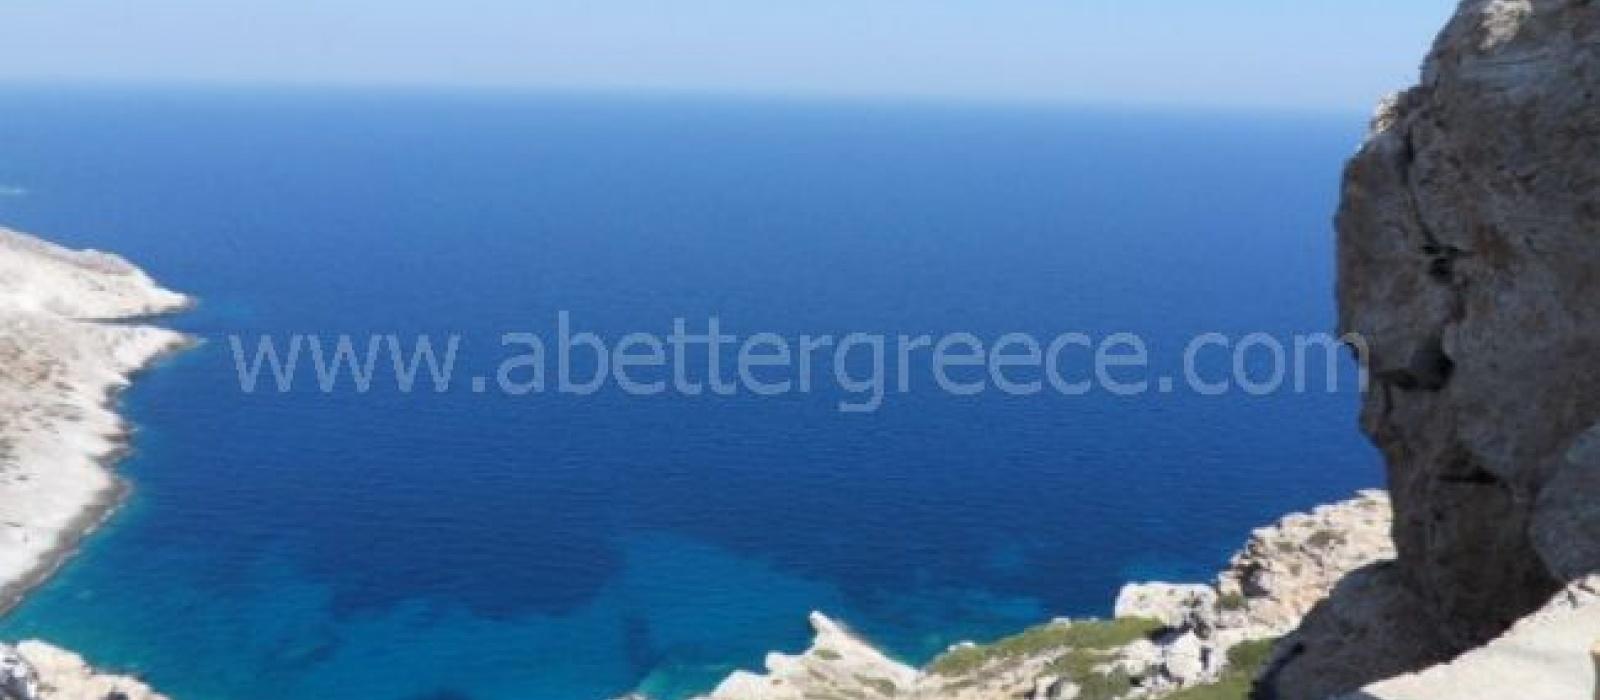 1 Bedrooms, Apartment, Vacation Rental, 1 Bathrooms, Listing ID 1135, Fologantros, Greece,